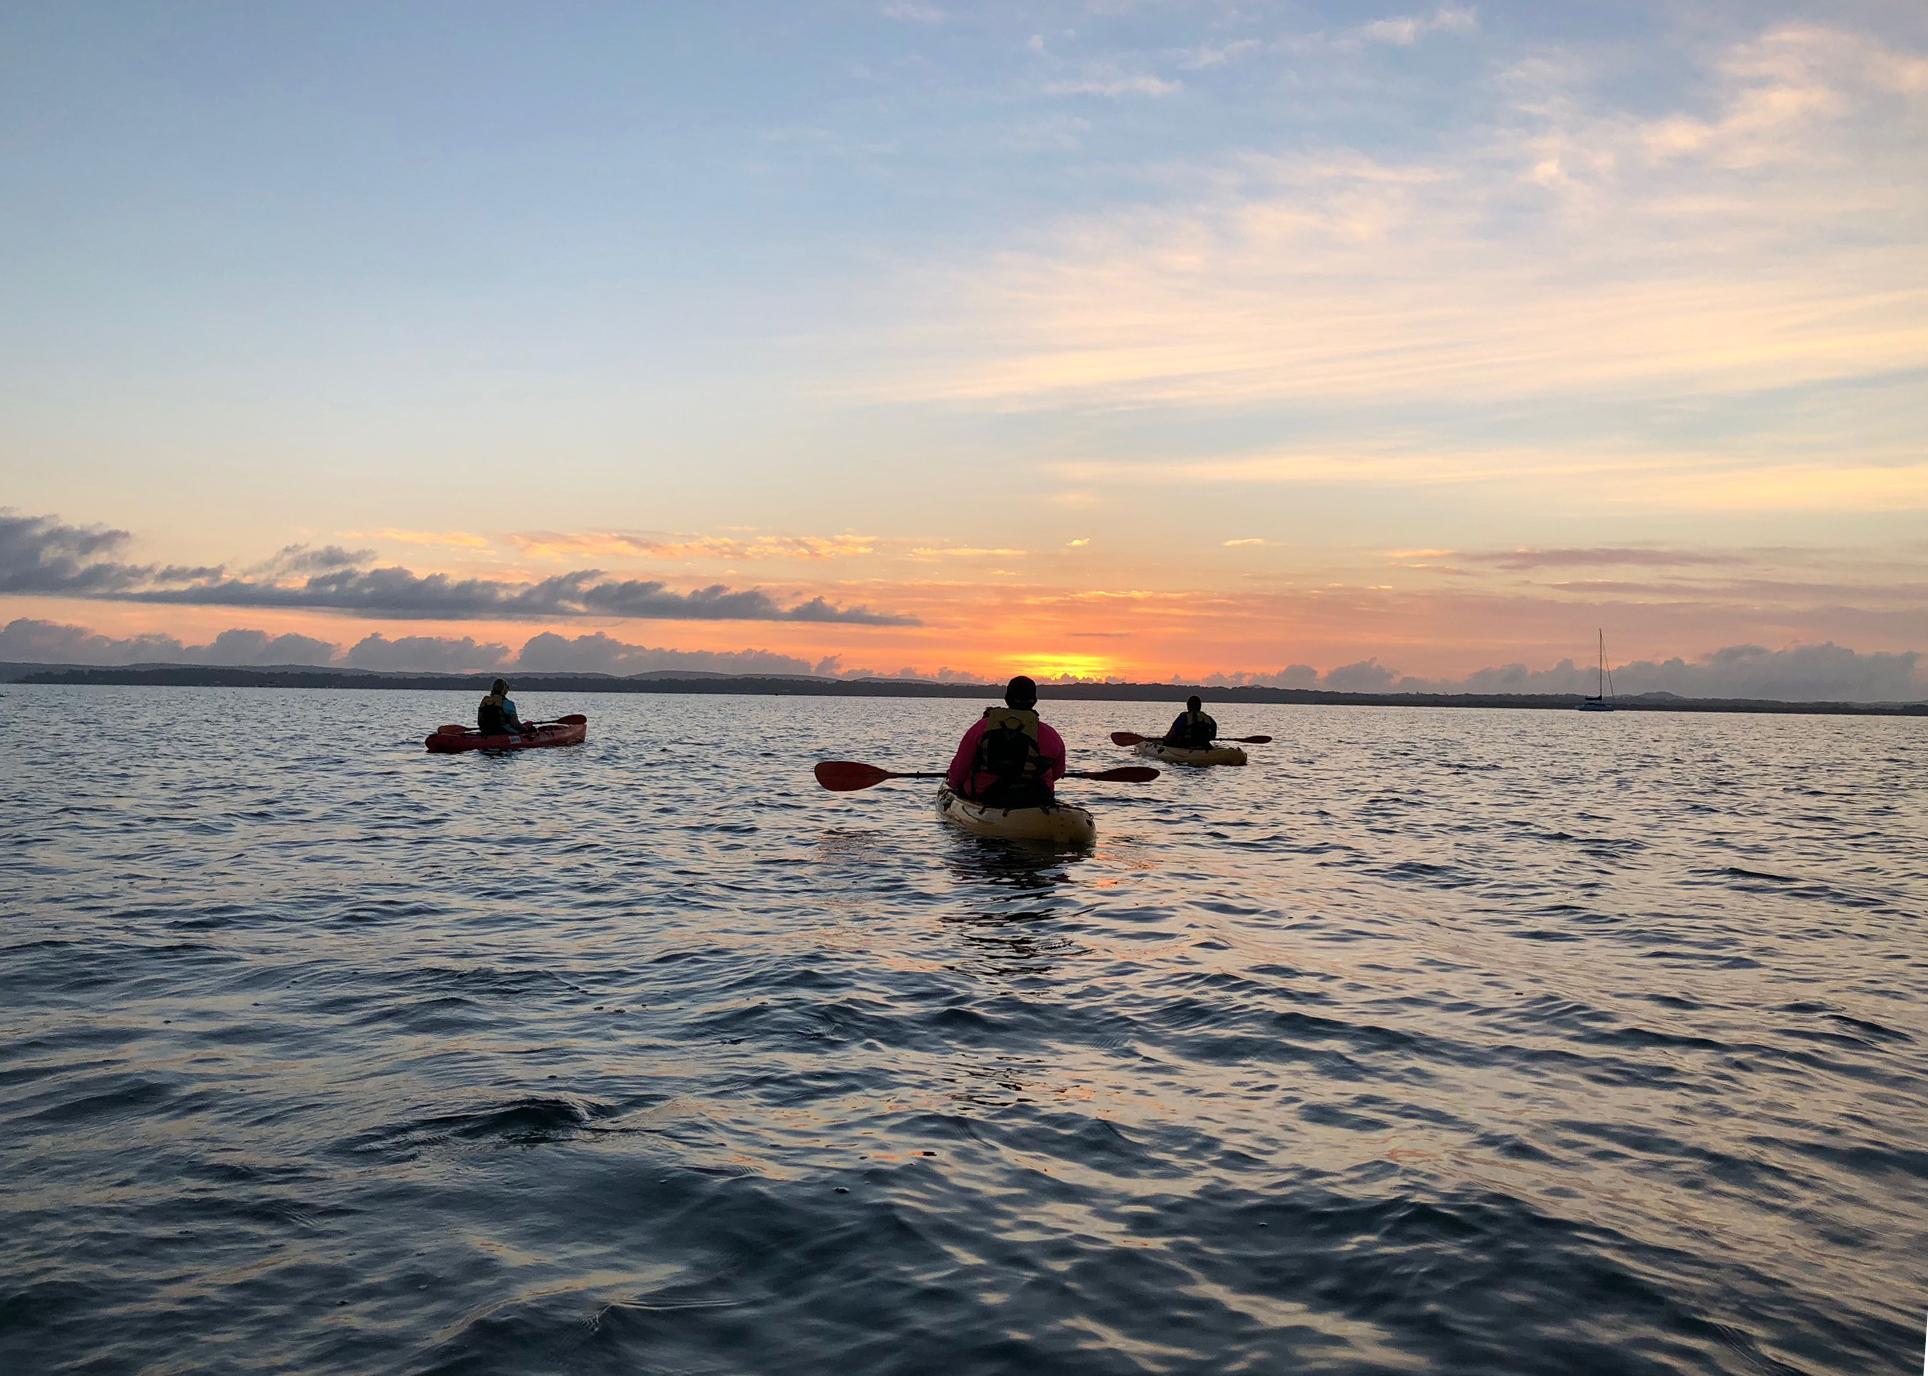 Sunrise Kayaking with Friends by Katrina Beutel